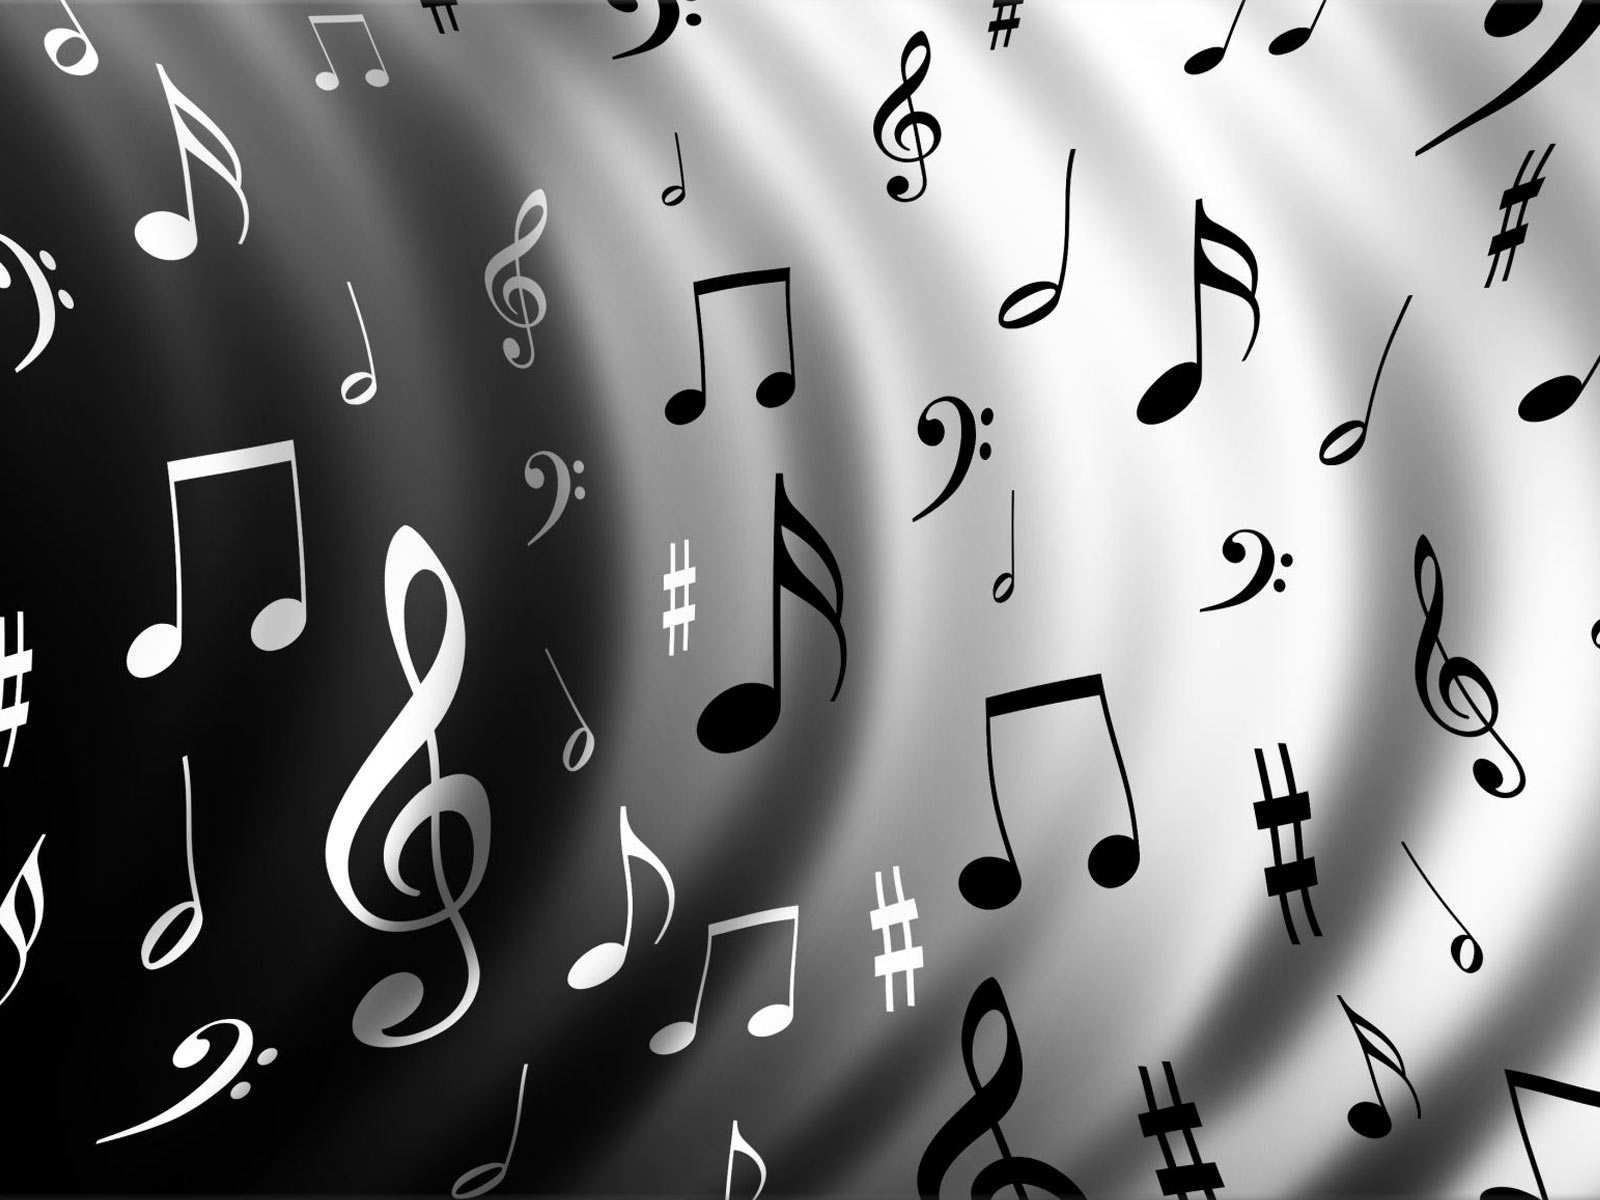 music-notes-wallpaper-music-24113988-1600-1200